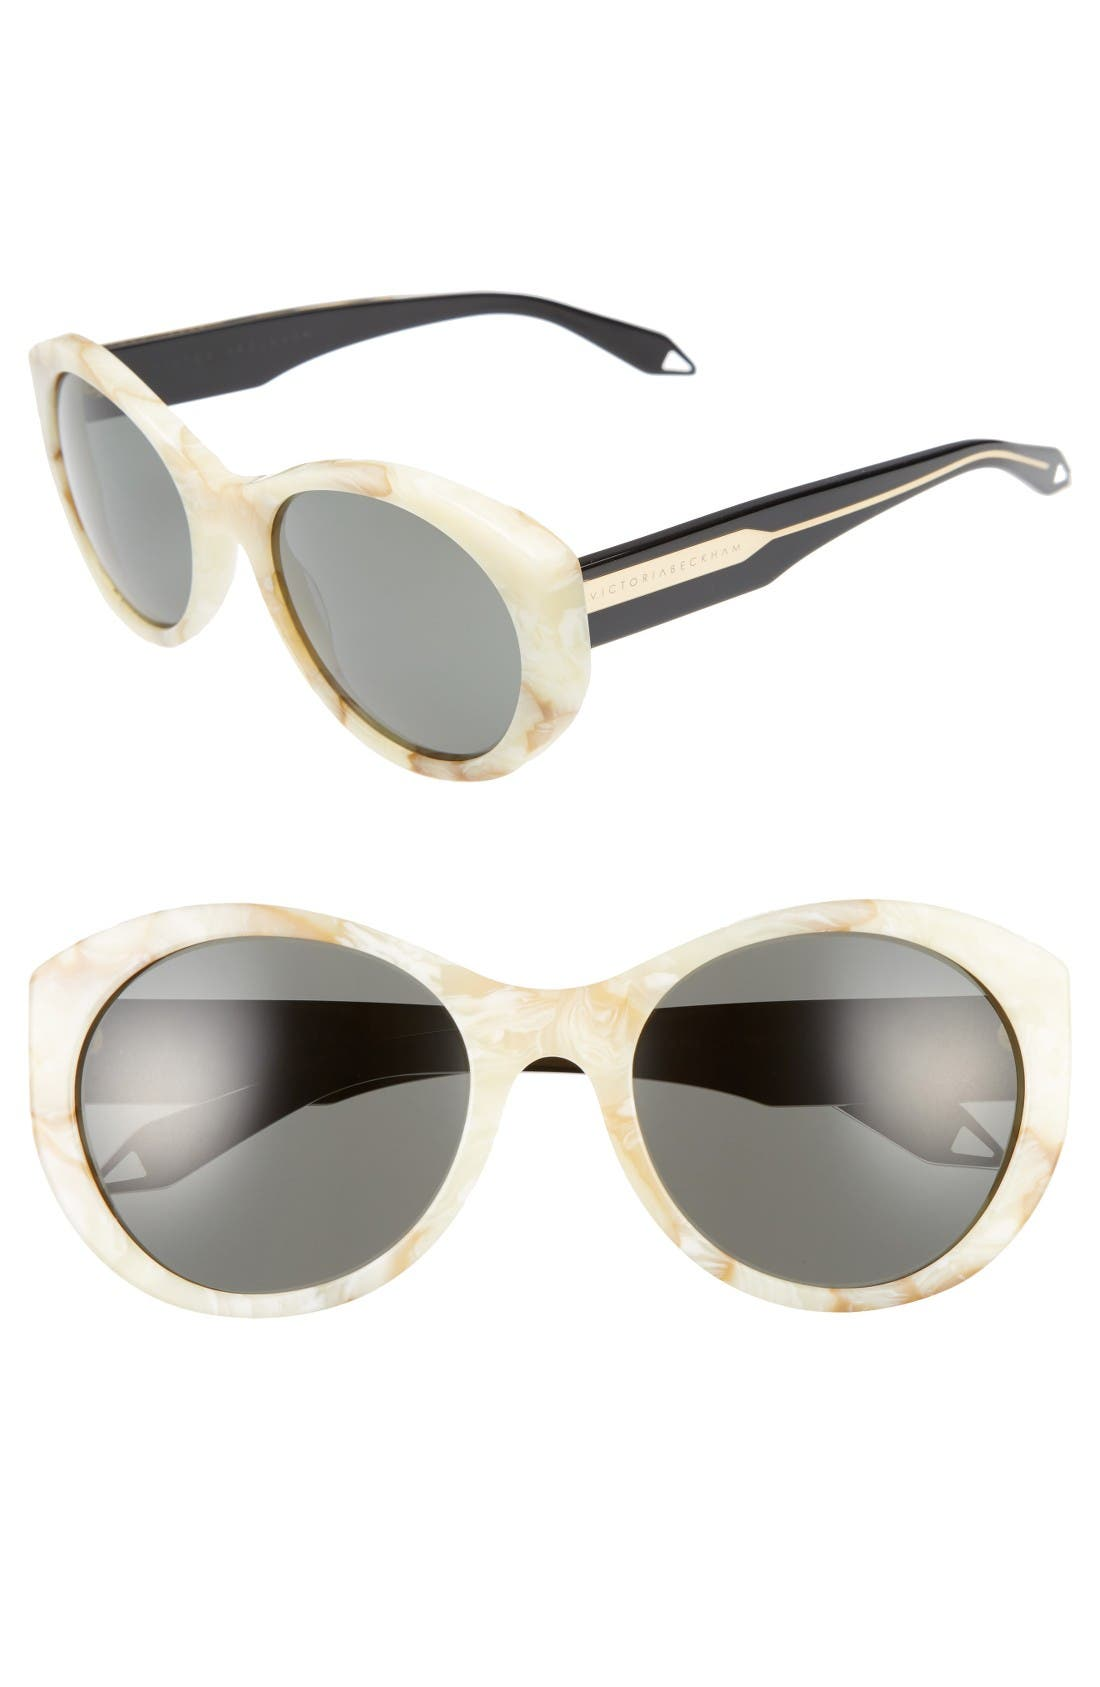 Main Image - Victoria Beckham Fine Oval 59mm Sunglasses